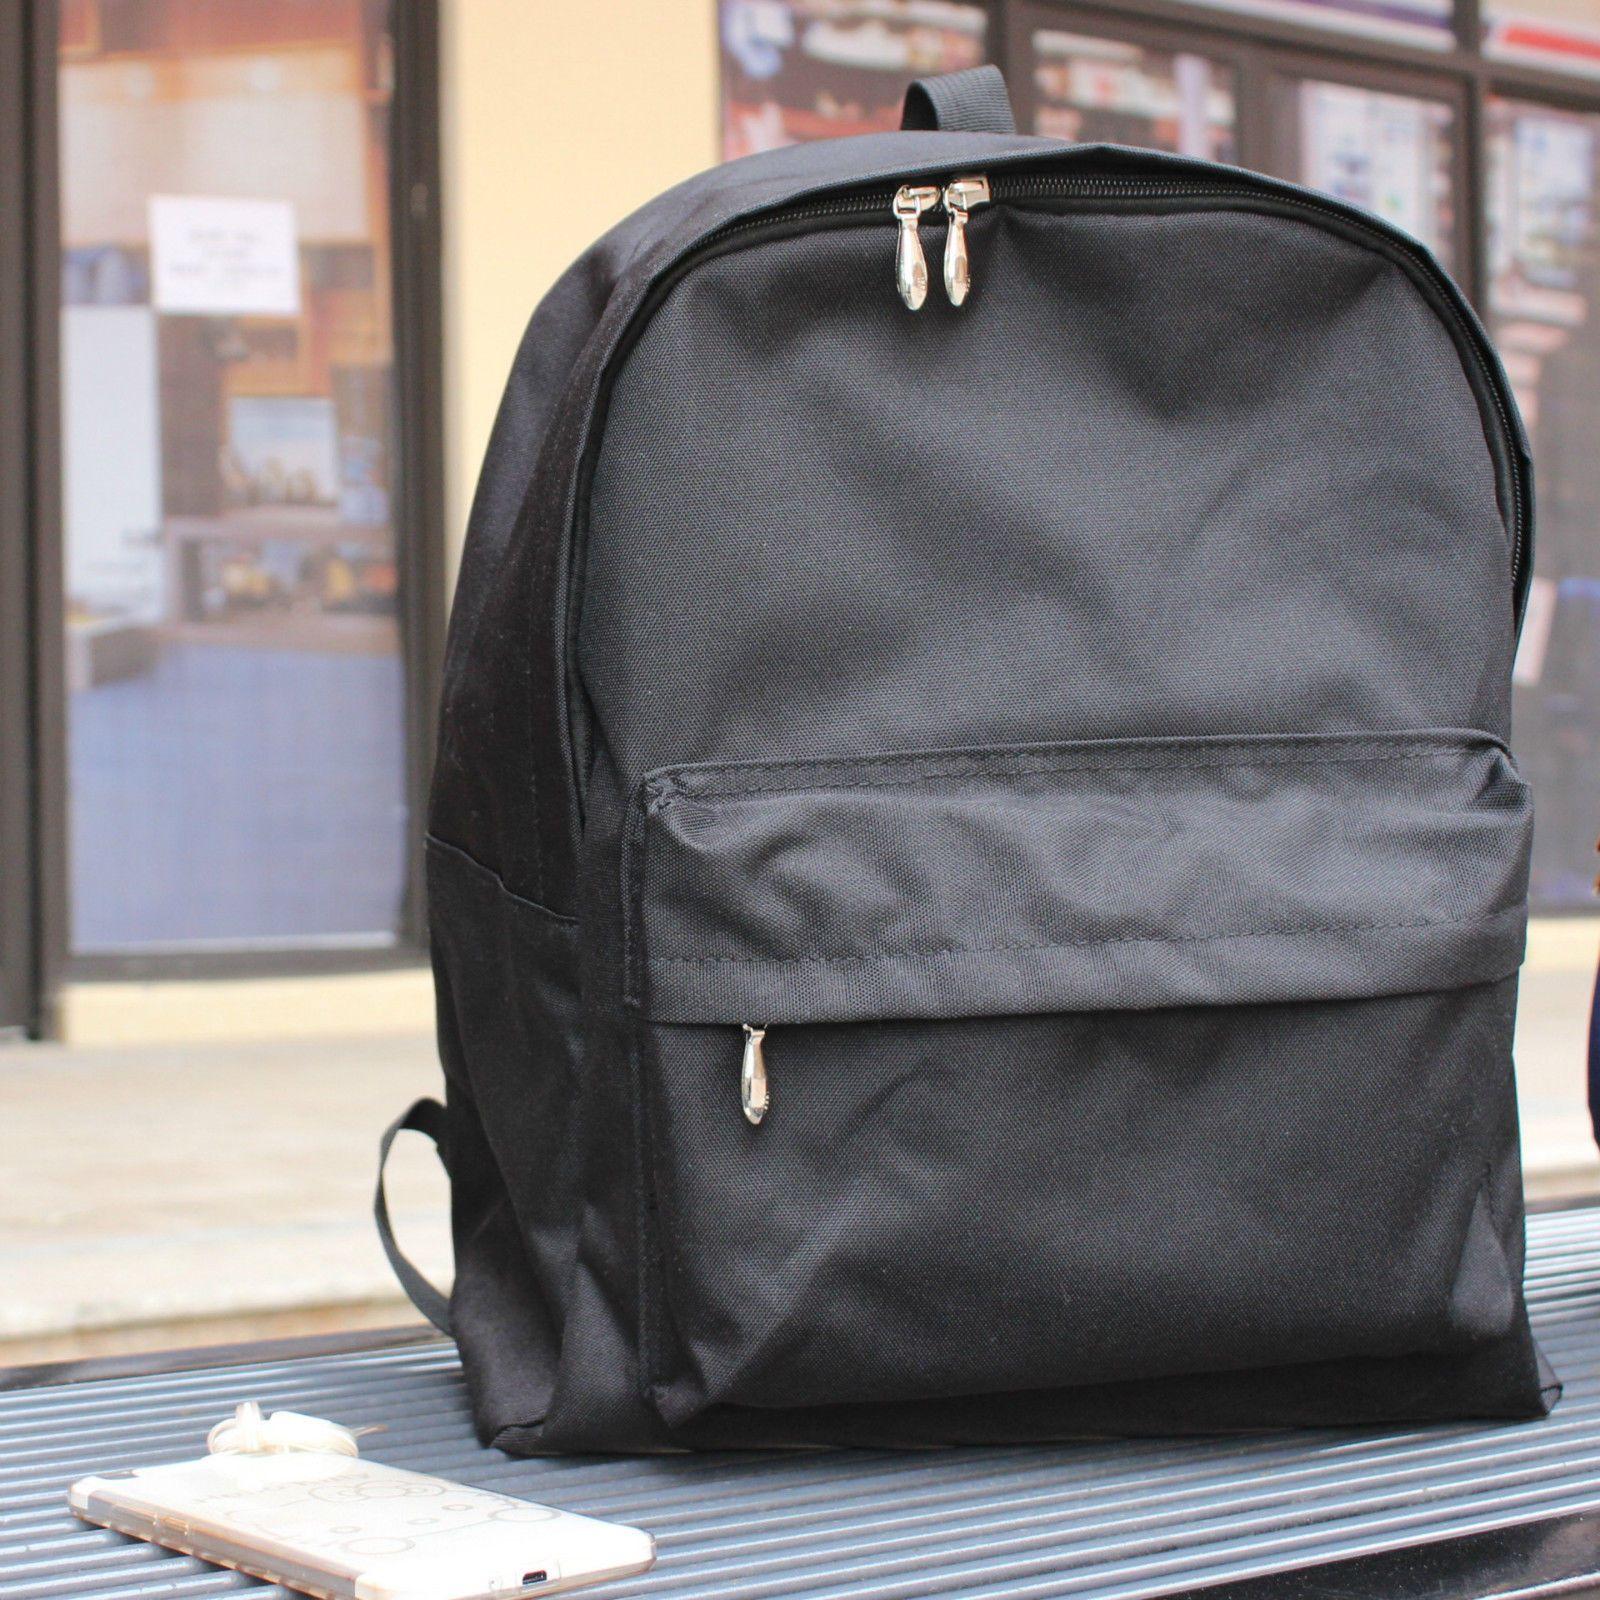 6898c6776764 Fashion Women Men Casual Backpack Students Bookbags Shoulder Bag Travel Bags